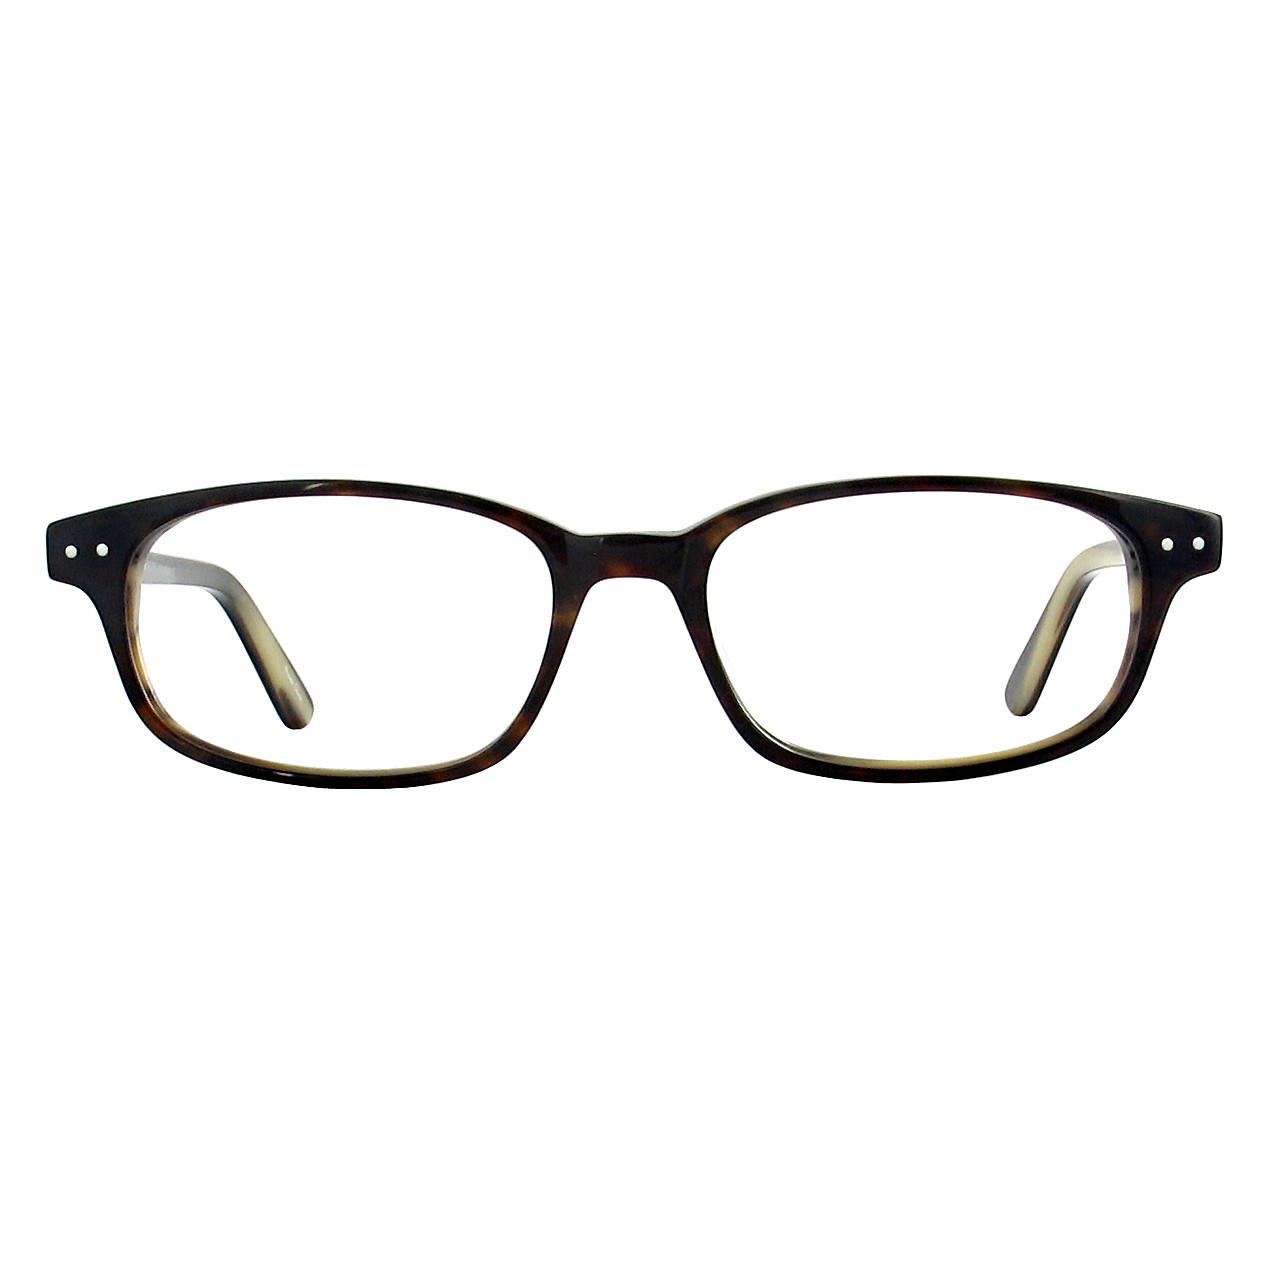 GEEK Eyewear GEEK 109